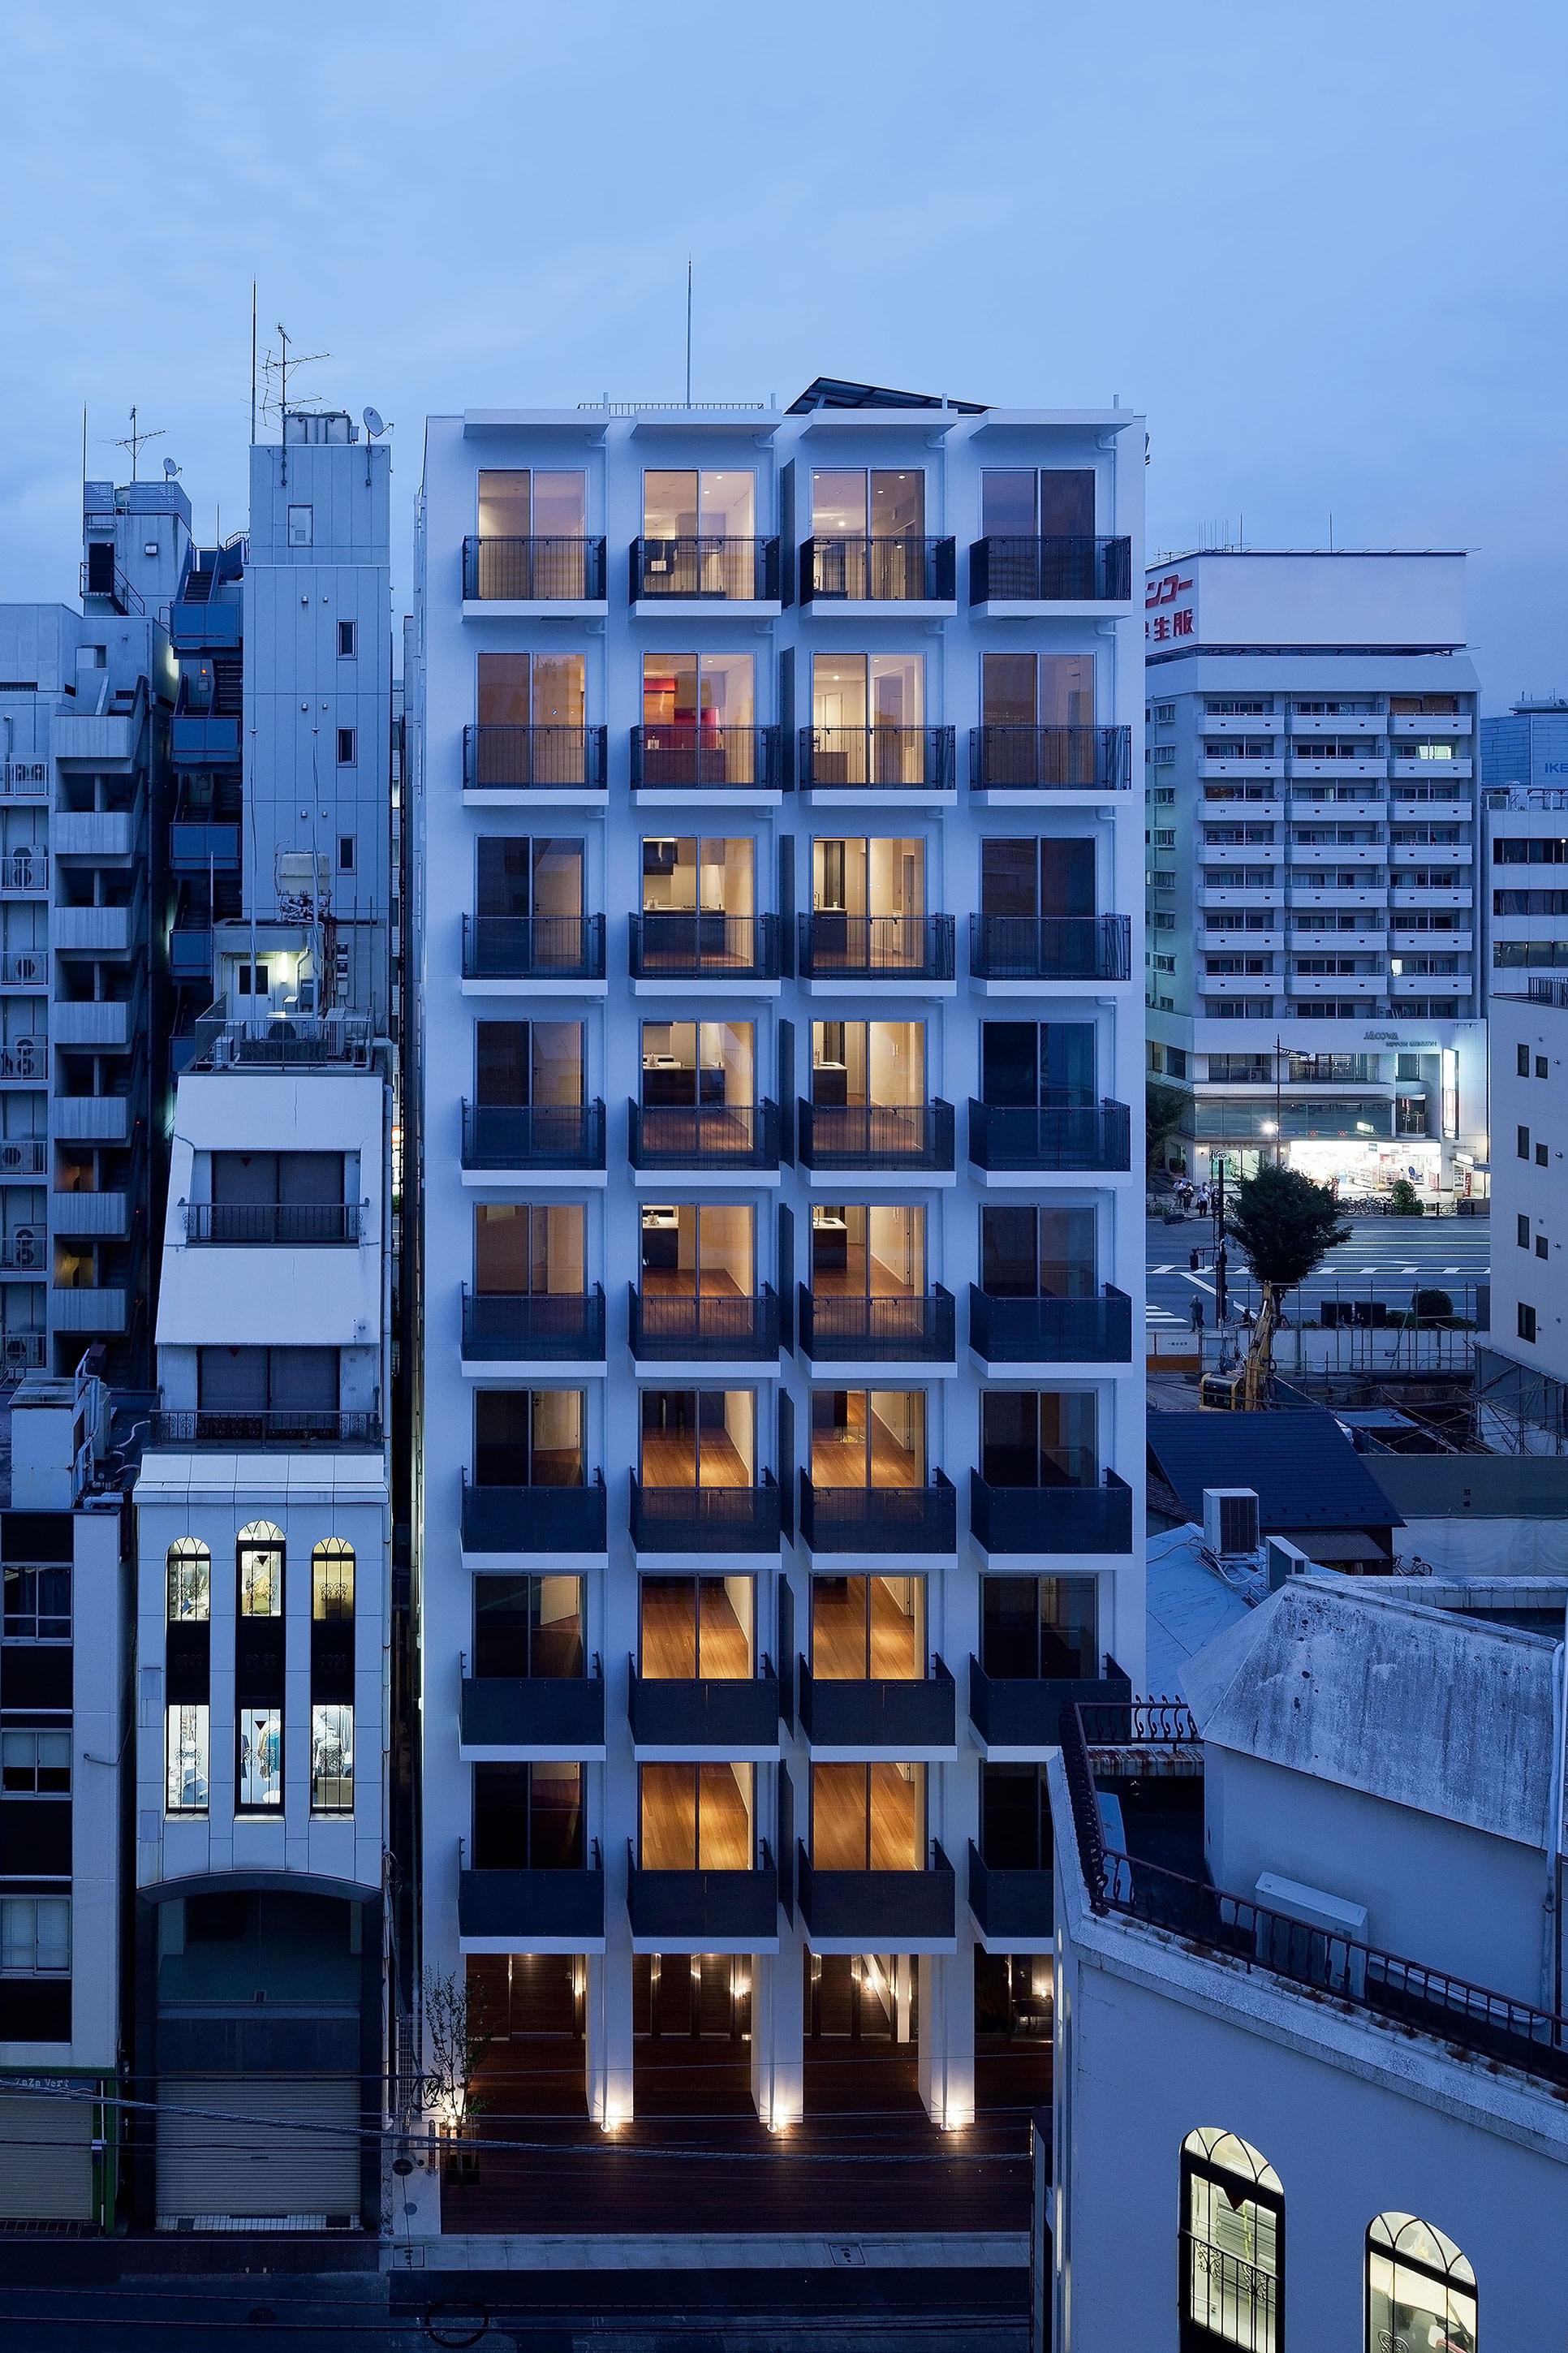 GREEN PARK 東日本橋 SQUARE | マンションギャラリー